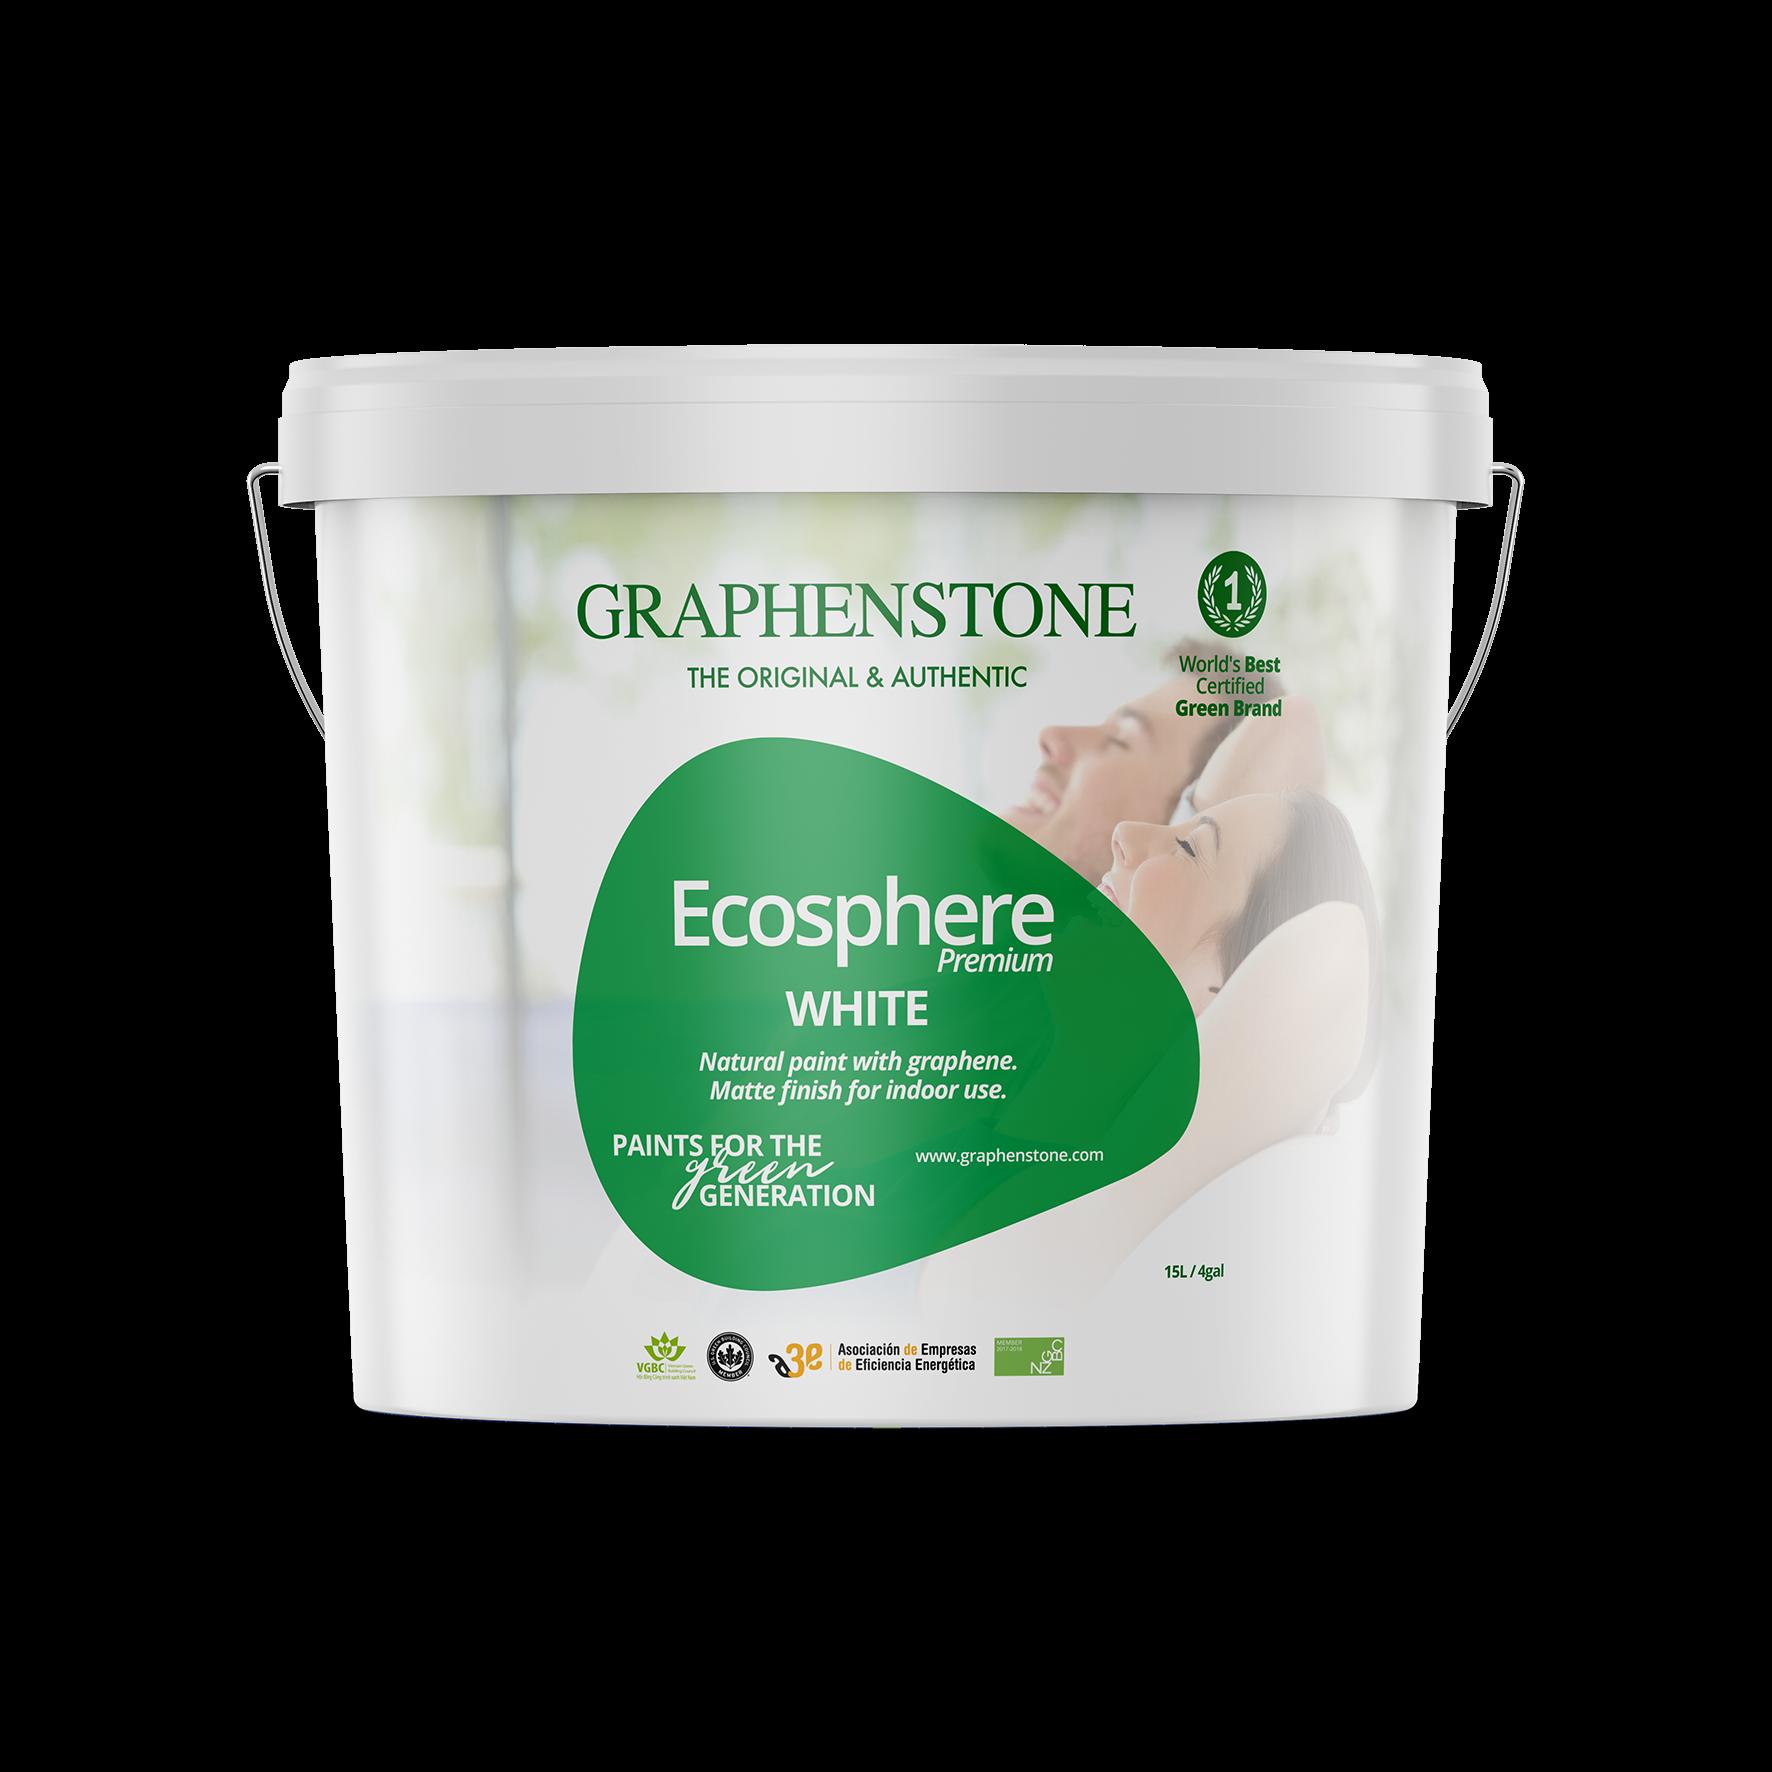 Graphenstone Ecosphere Premium - White Internal Paint